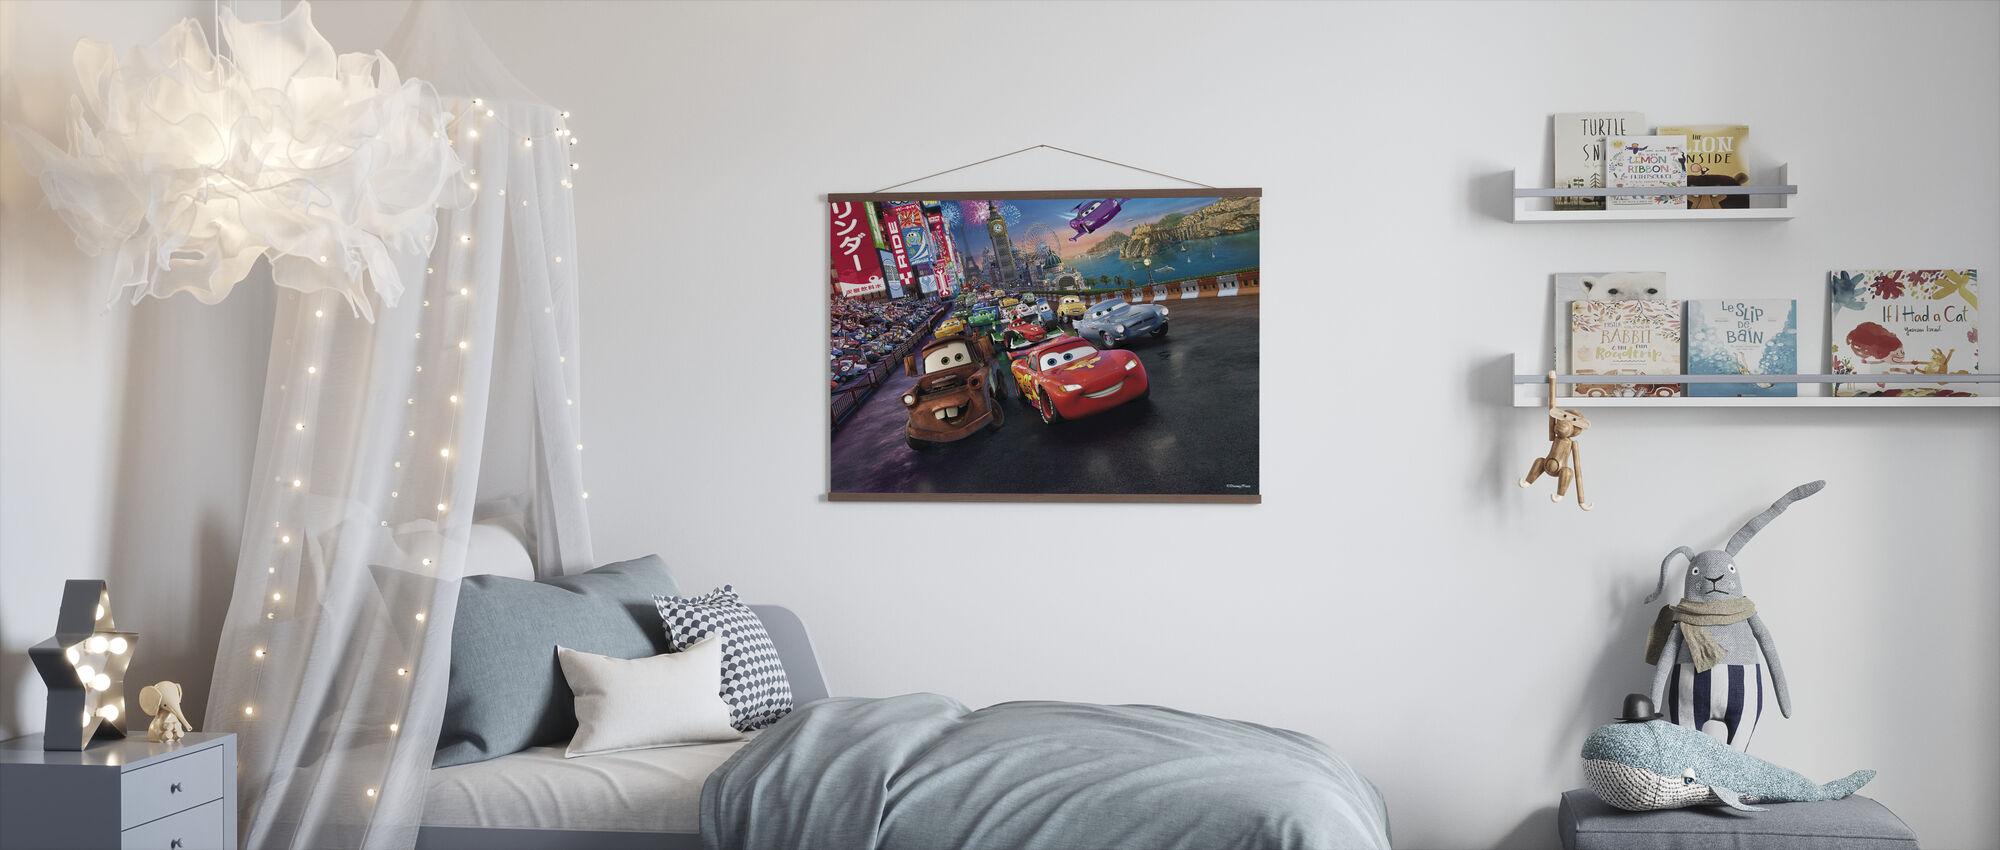 Biler biler biler - Plakat - Barnerom